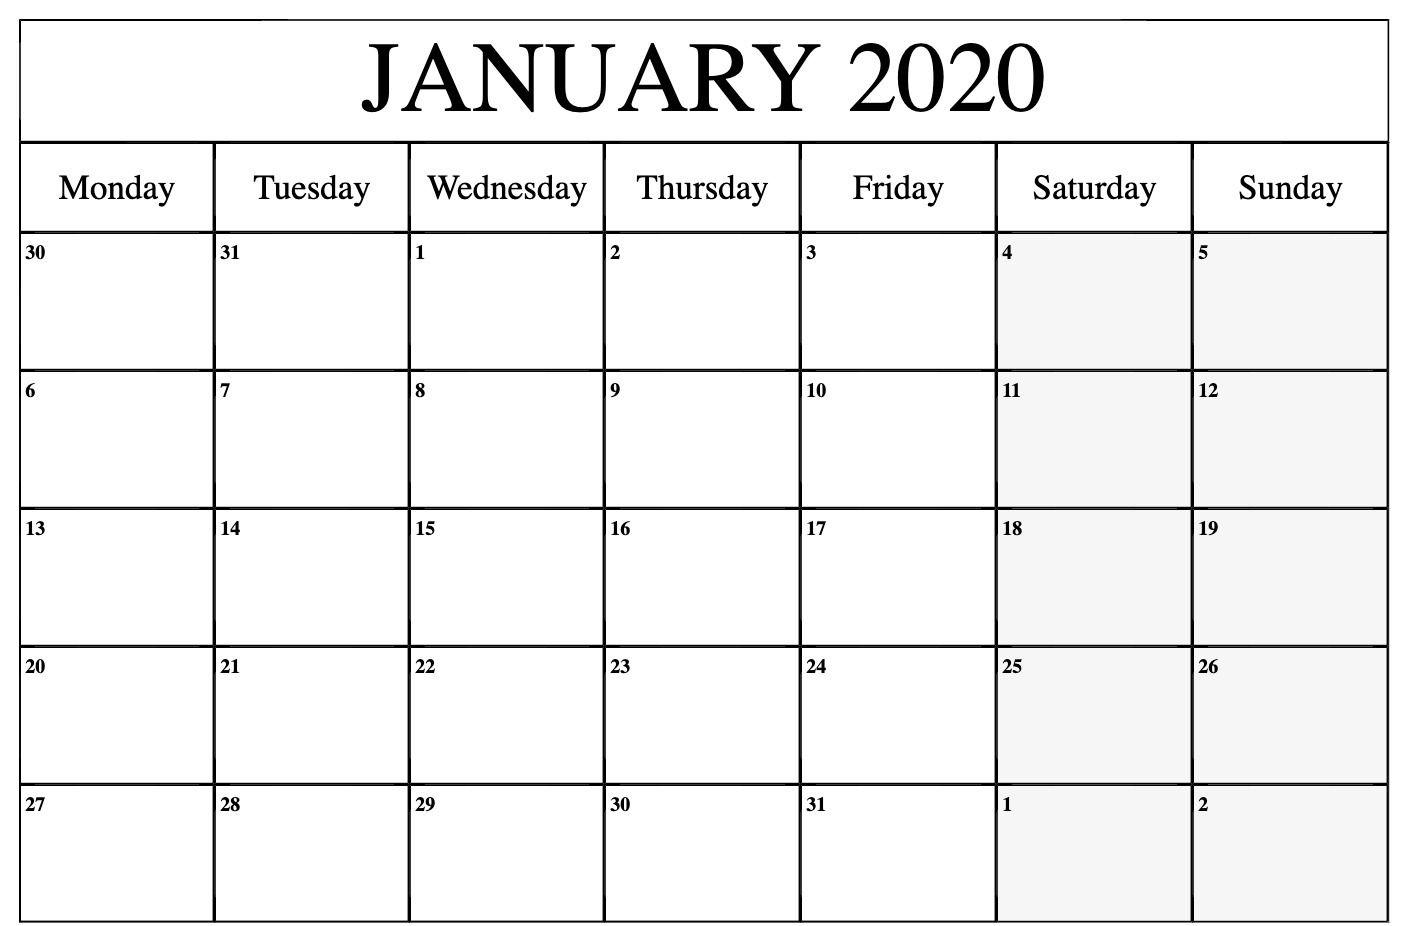 Free January Calendar 2020 Printable Template Blank In Pdf pertaining to 2020 Calendar Print Mon To Sunday